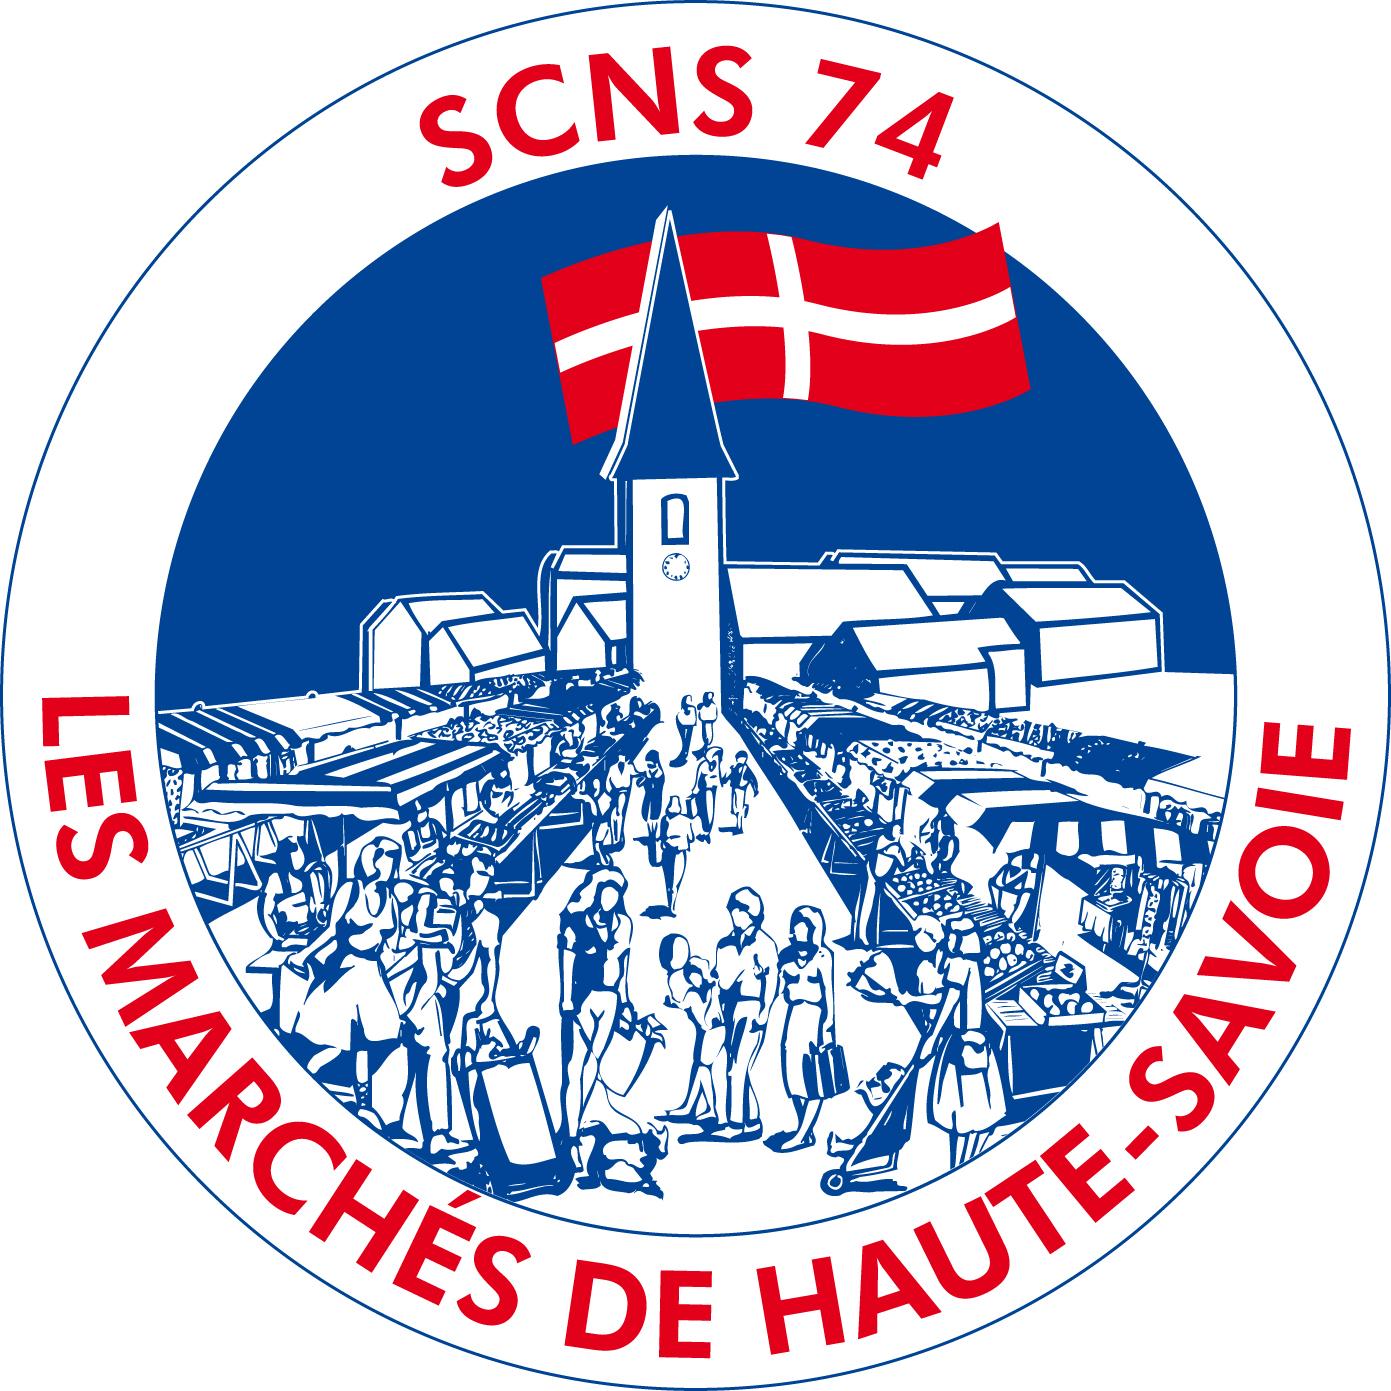 cns74, logo, syndicat, commercants, non sedentaires, haute-savoie, marnaz